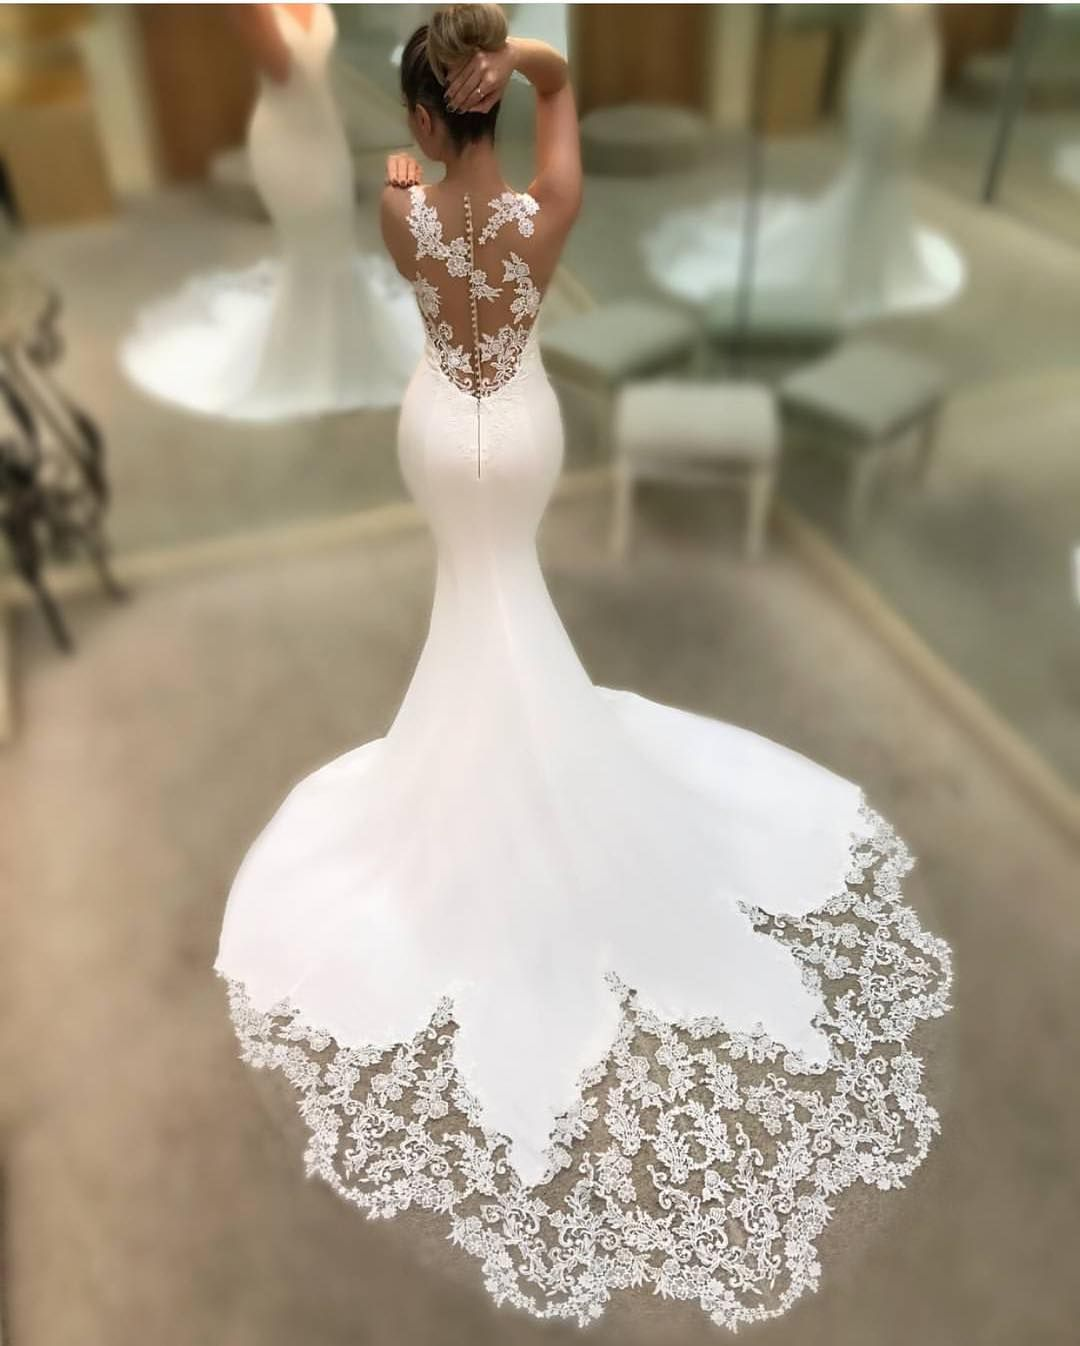 Pin by alicia hattingh on thé big day in pinterest wedding